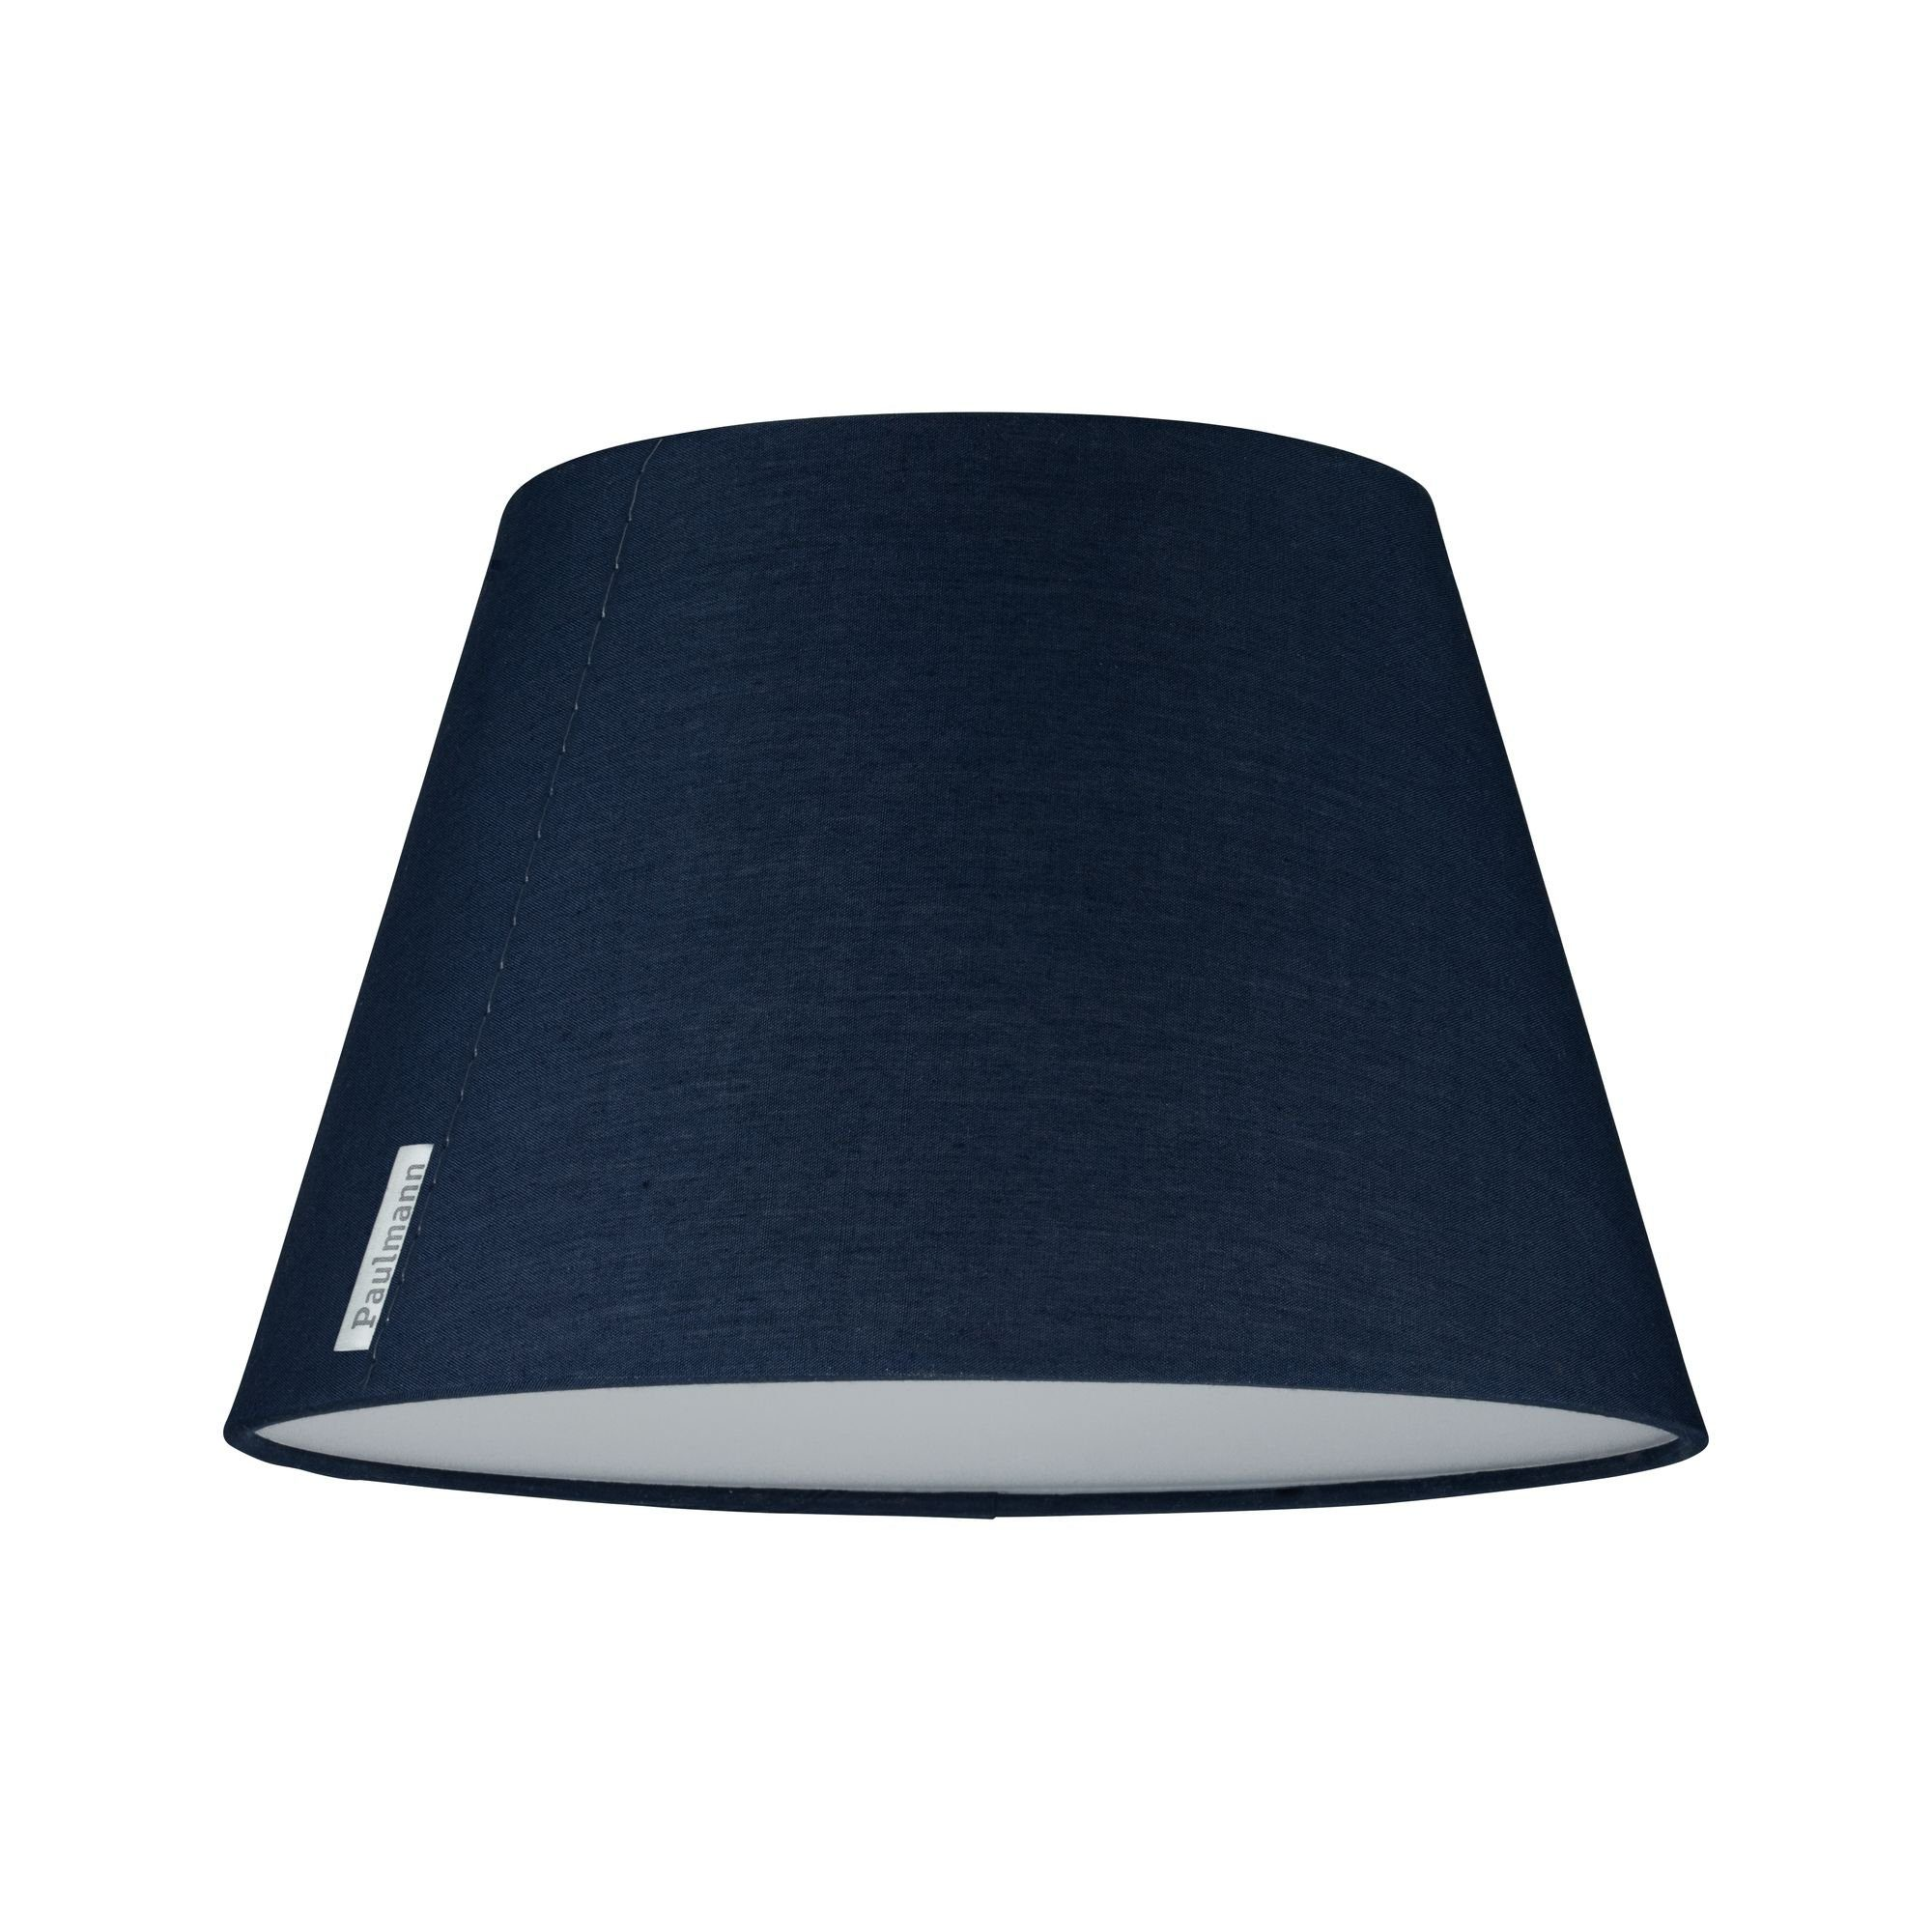 Paulmann LED Deckenleuchte Mea Blau mit Stoffschirm Durchmesser 25 cm max. 20W E14, E14, 1 St.